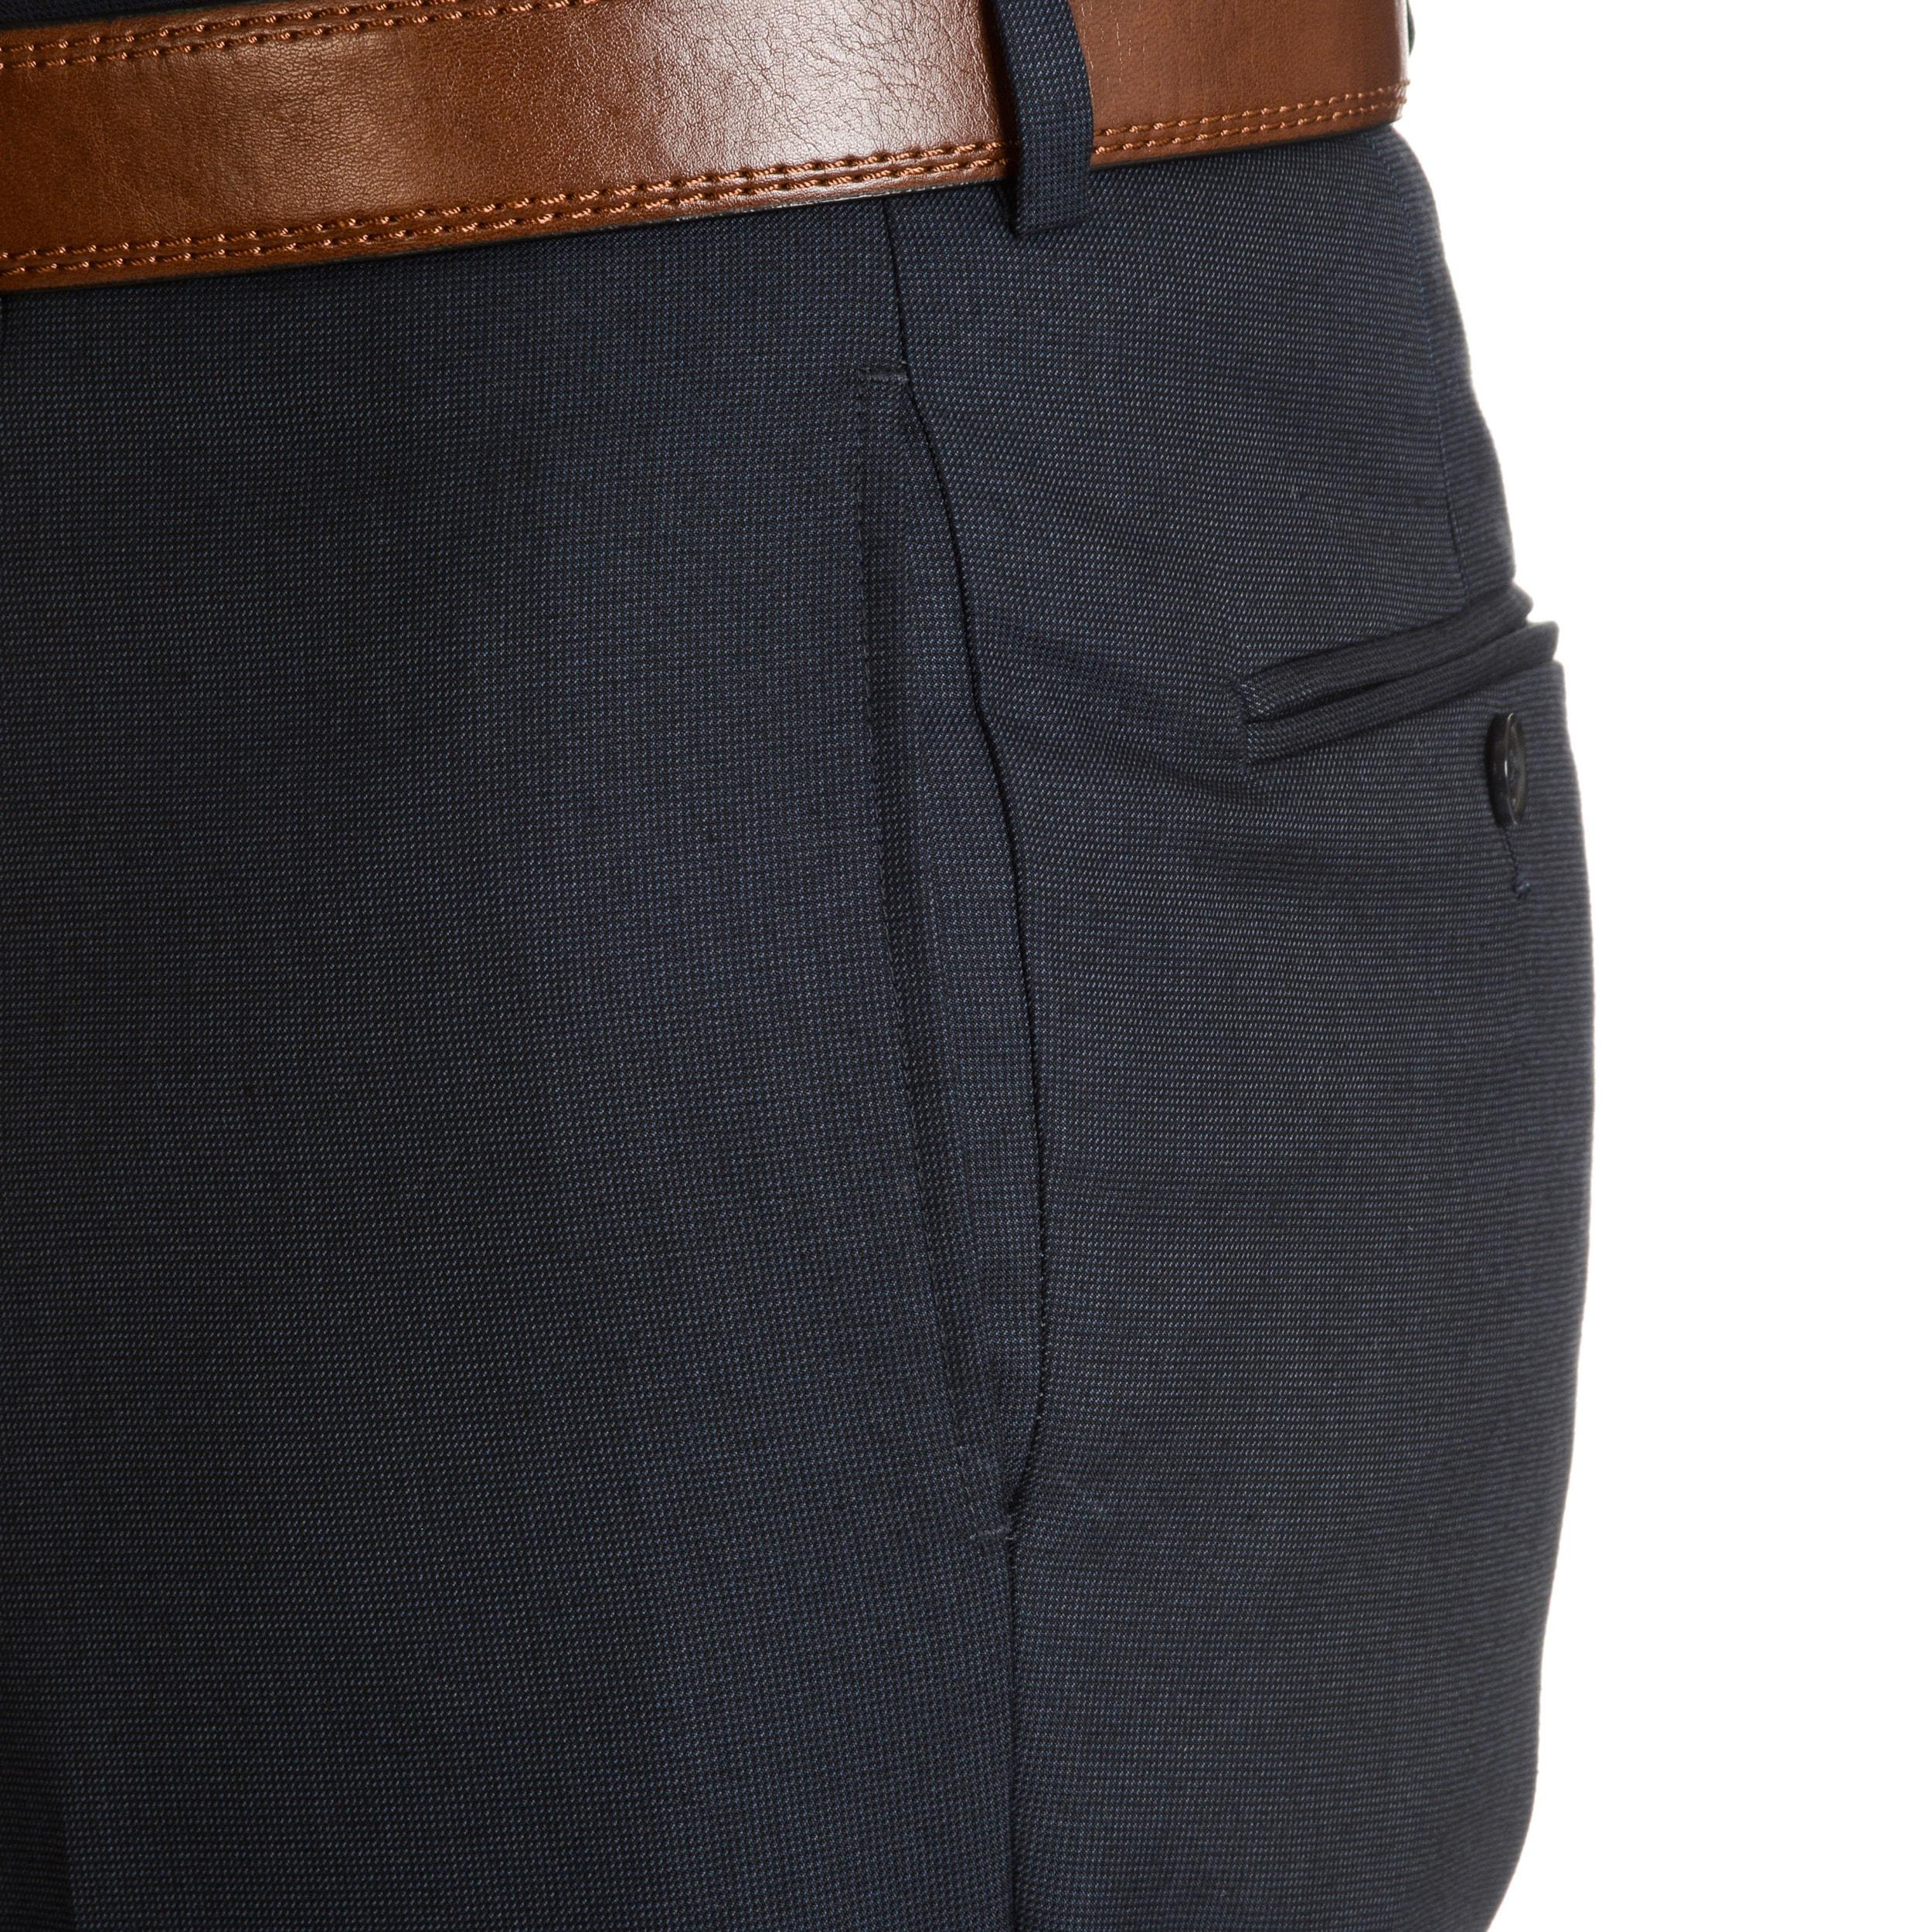 Outlet Popular Pick A Best Cheap Online Leather Slim Fit Mini Skirt UK12 - Sales Up to -50% Tommy Hilfiger Sale Get Authentic 9Qx6qD